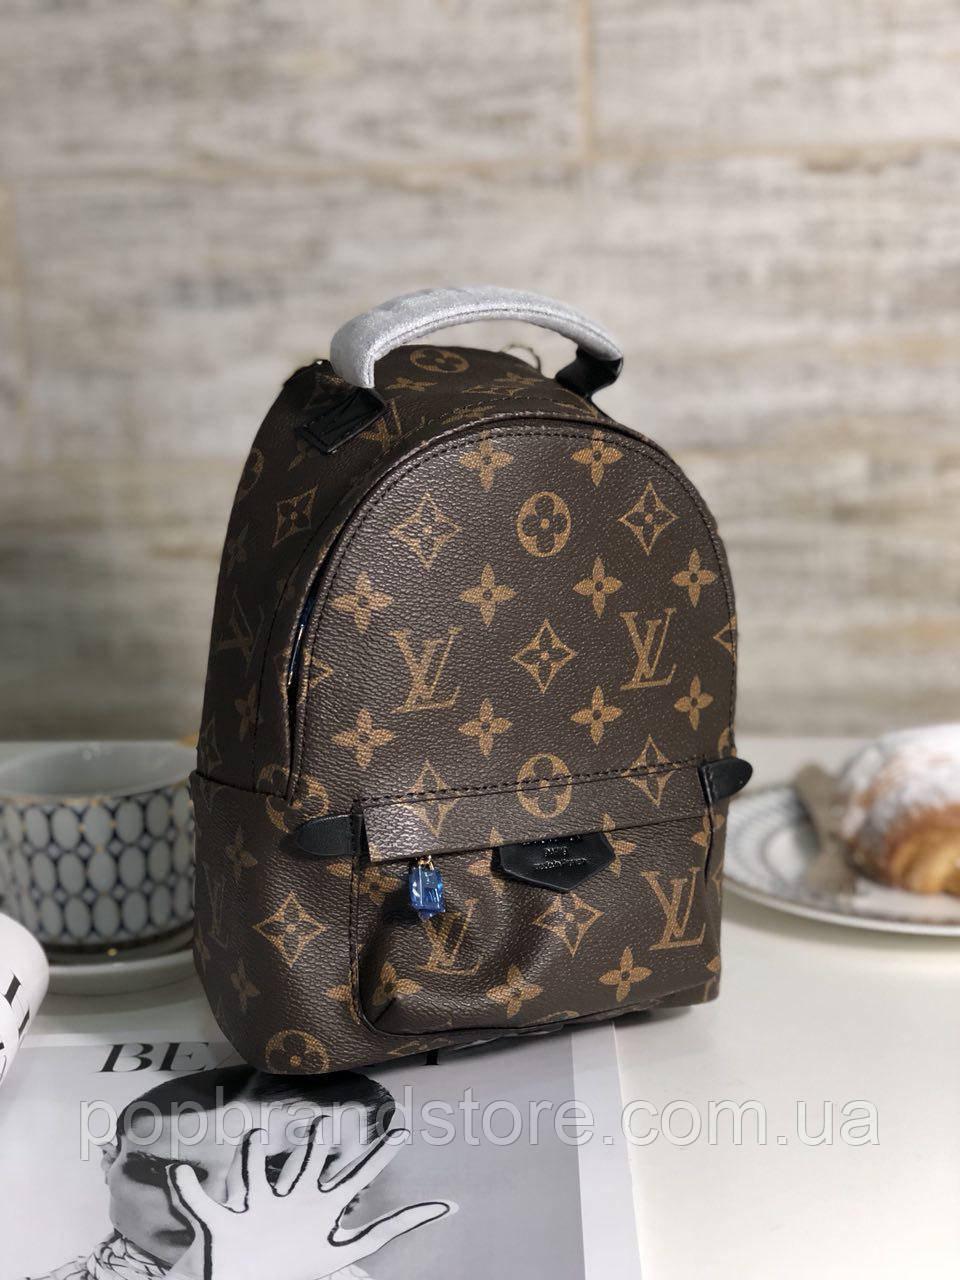 5bf1b1739033 Крутой женский рюкзак LOUIS VUITTON PALM SPRING mini LUX (реплика ...